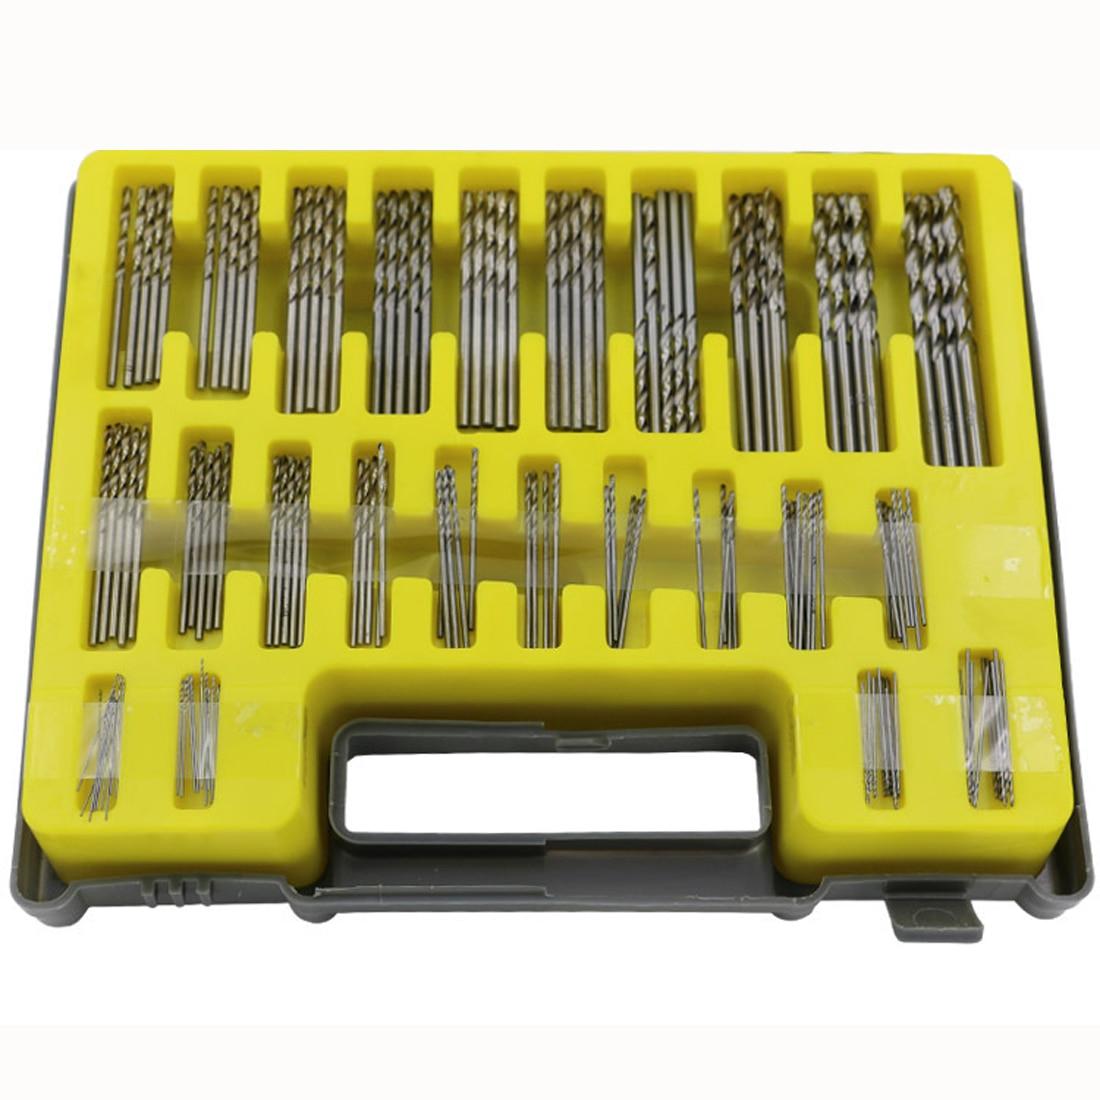 Hand & Power Tool Accessories 150pcs 0.4-3.2mm Drill Bit Set Small Precision With Carry Case Plastic Box Mini Hss Hand Tools Twist Drill Kit Set At All Costs